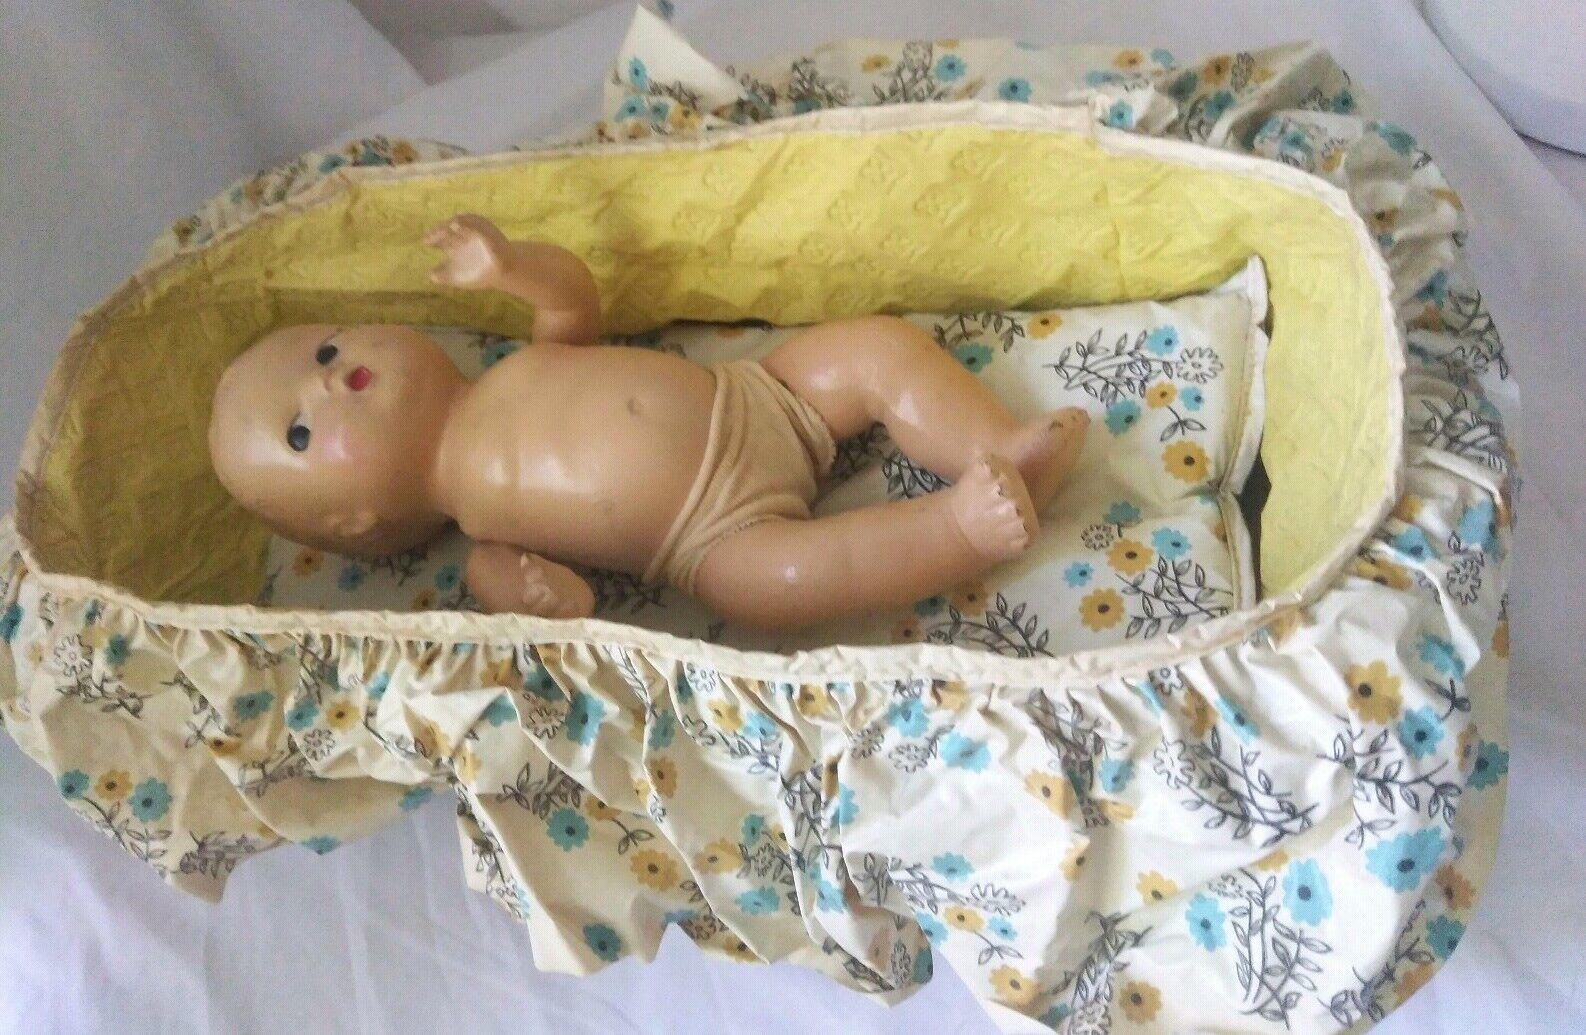 Antique Composition bambola bambino set  in Diaper string jointed  bambolaies cradellete  il più economico